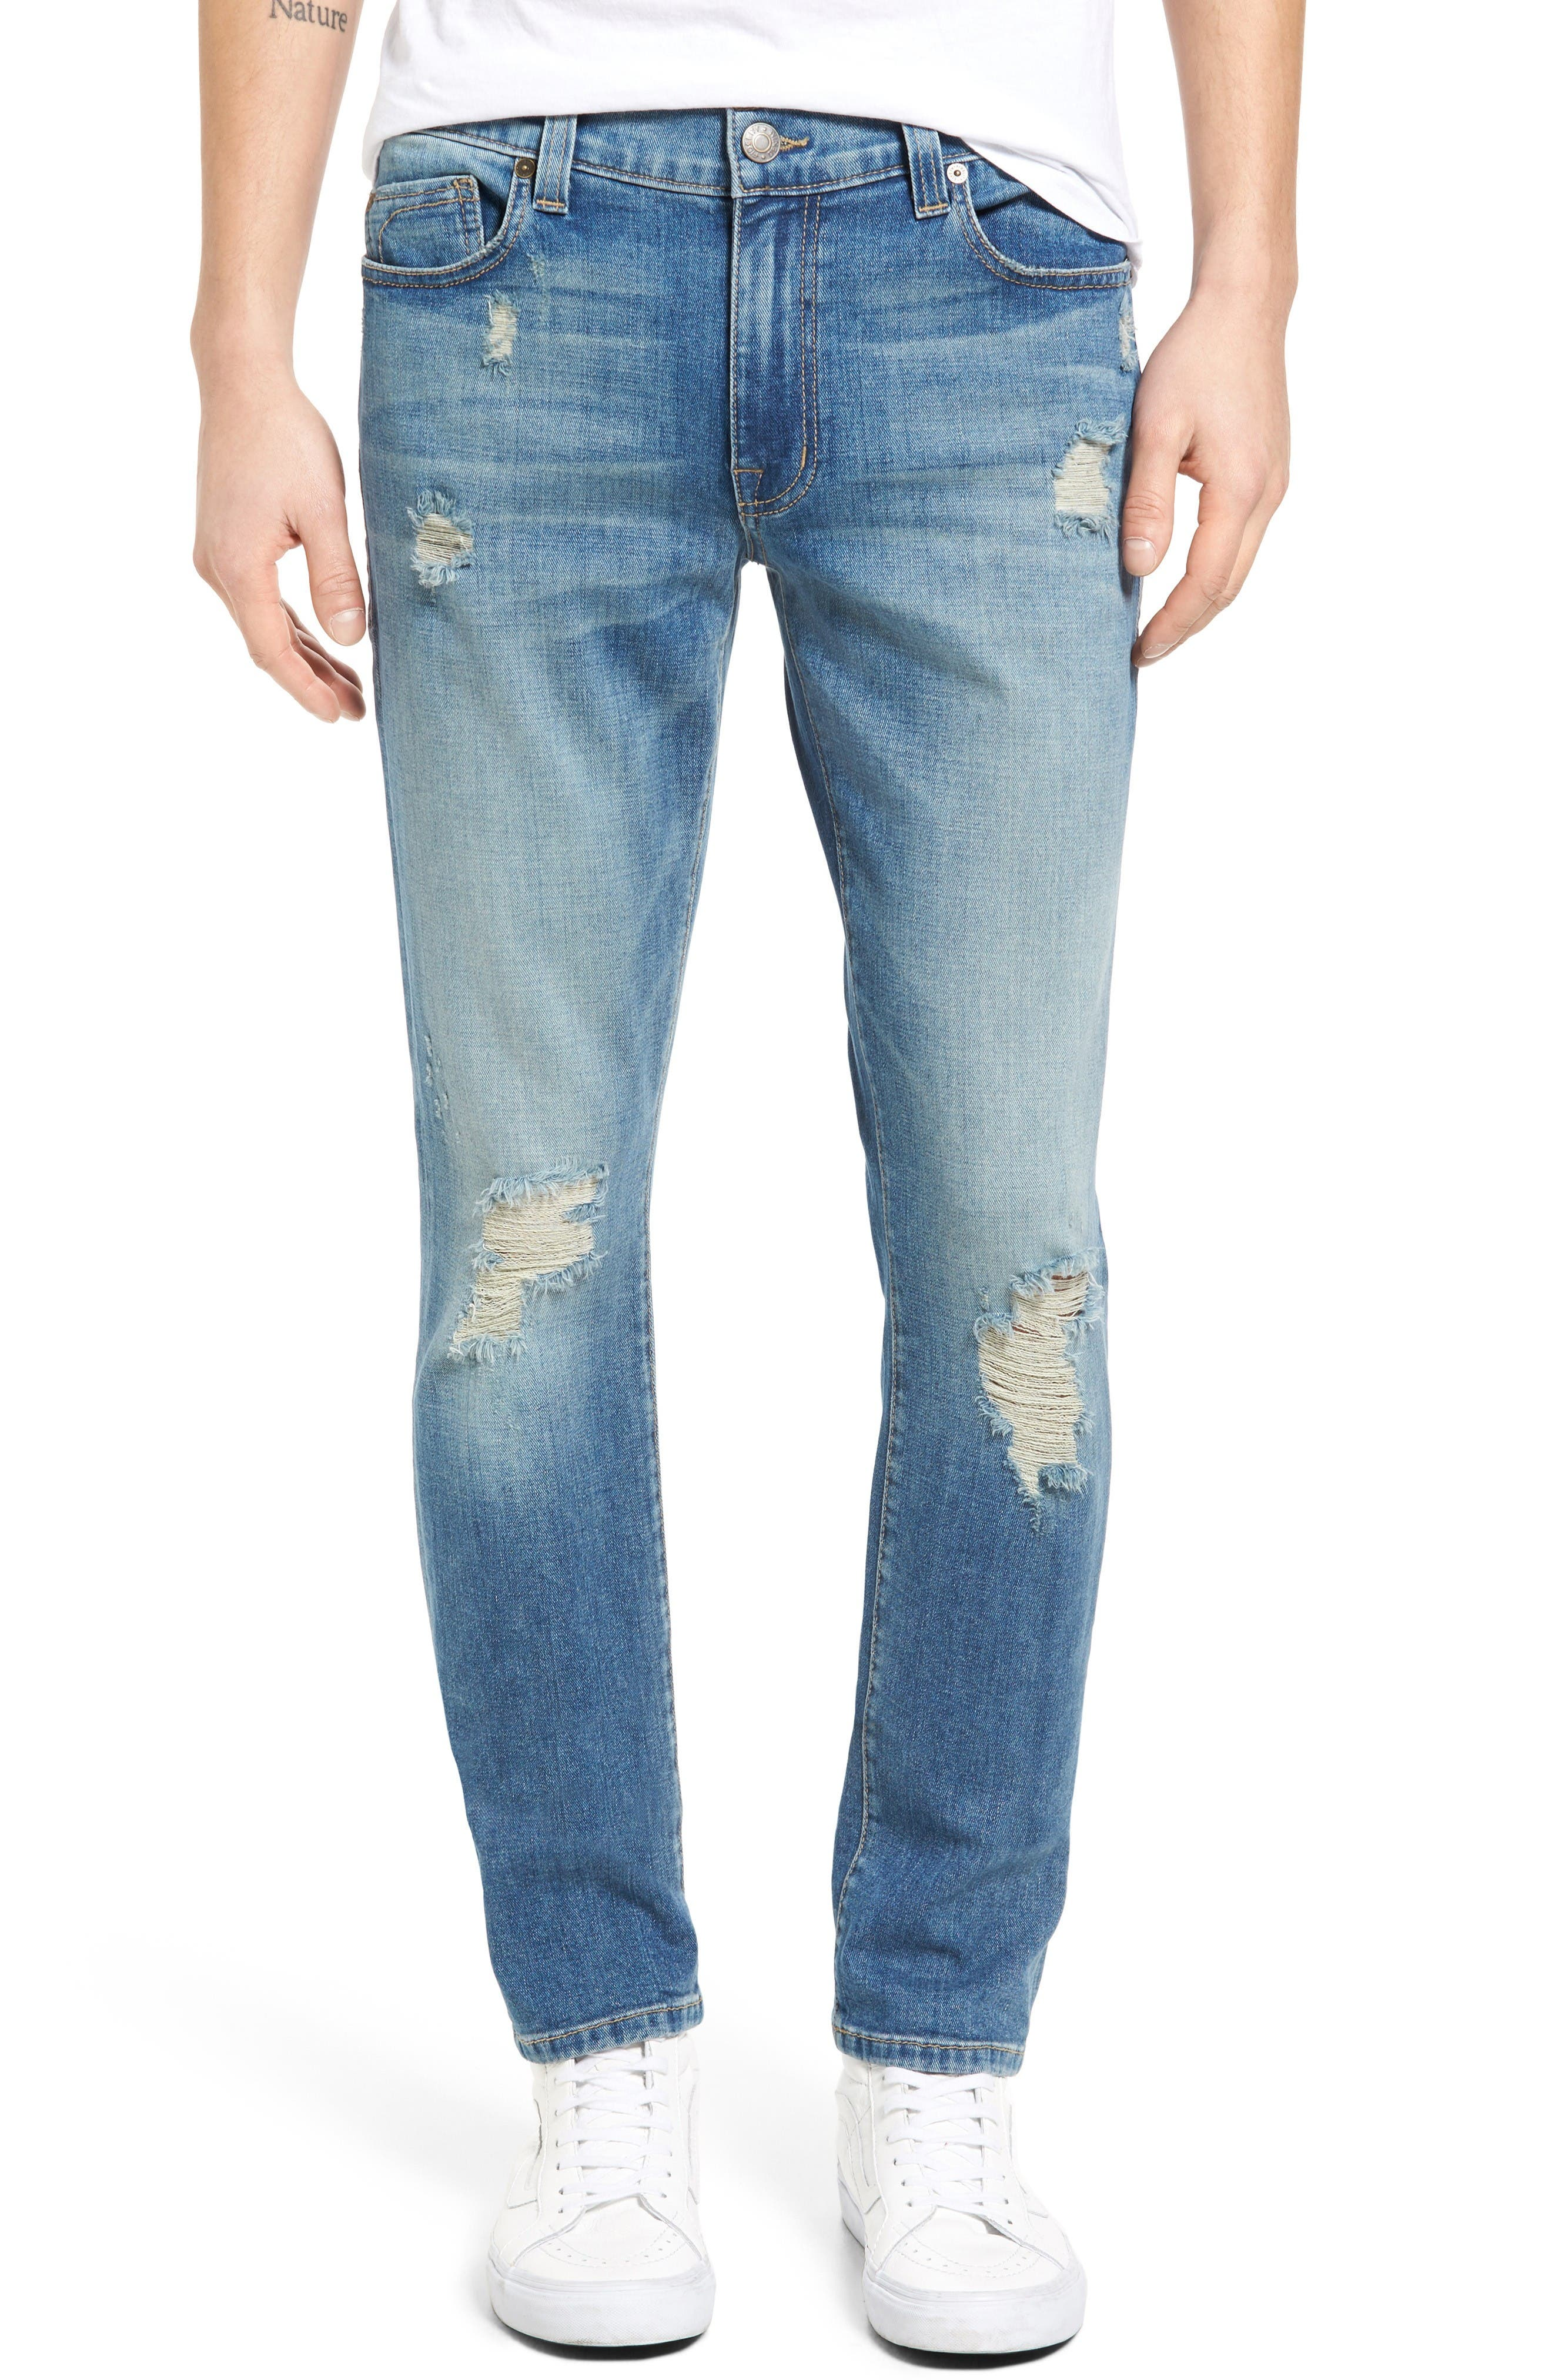 FIDELITY DENIM Torino Slim Fit Jeans